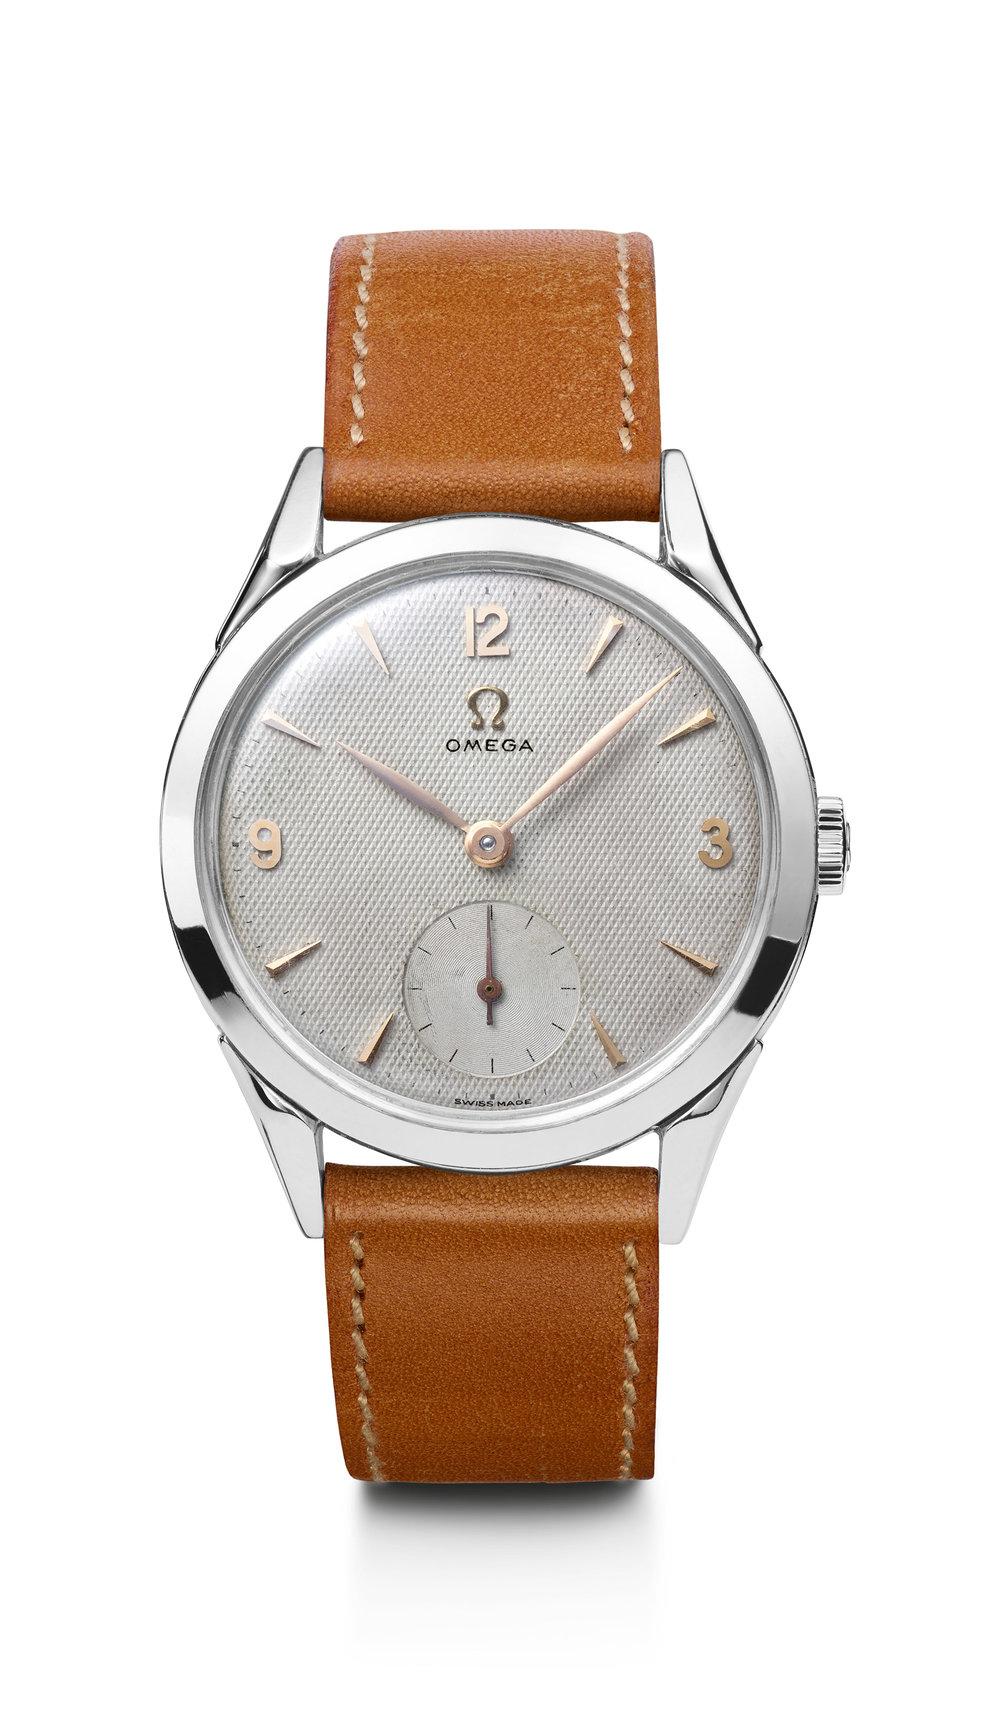 OMEGA wristwatch CK 2605_low.jpg